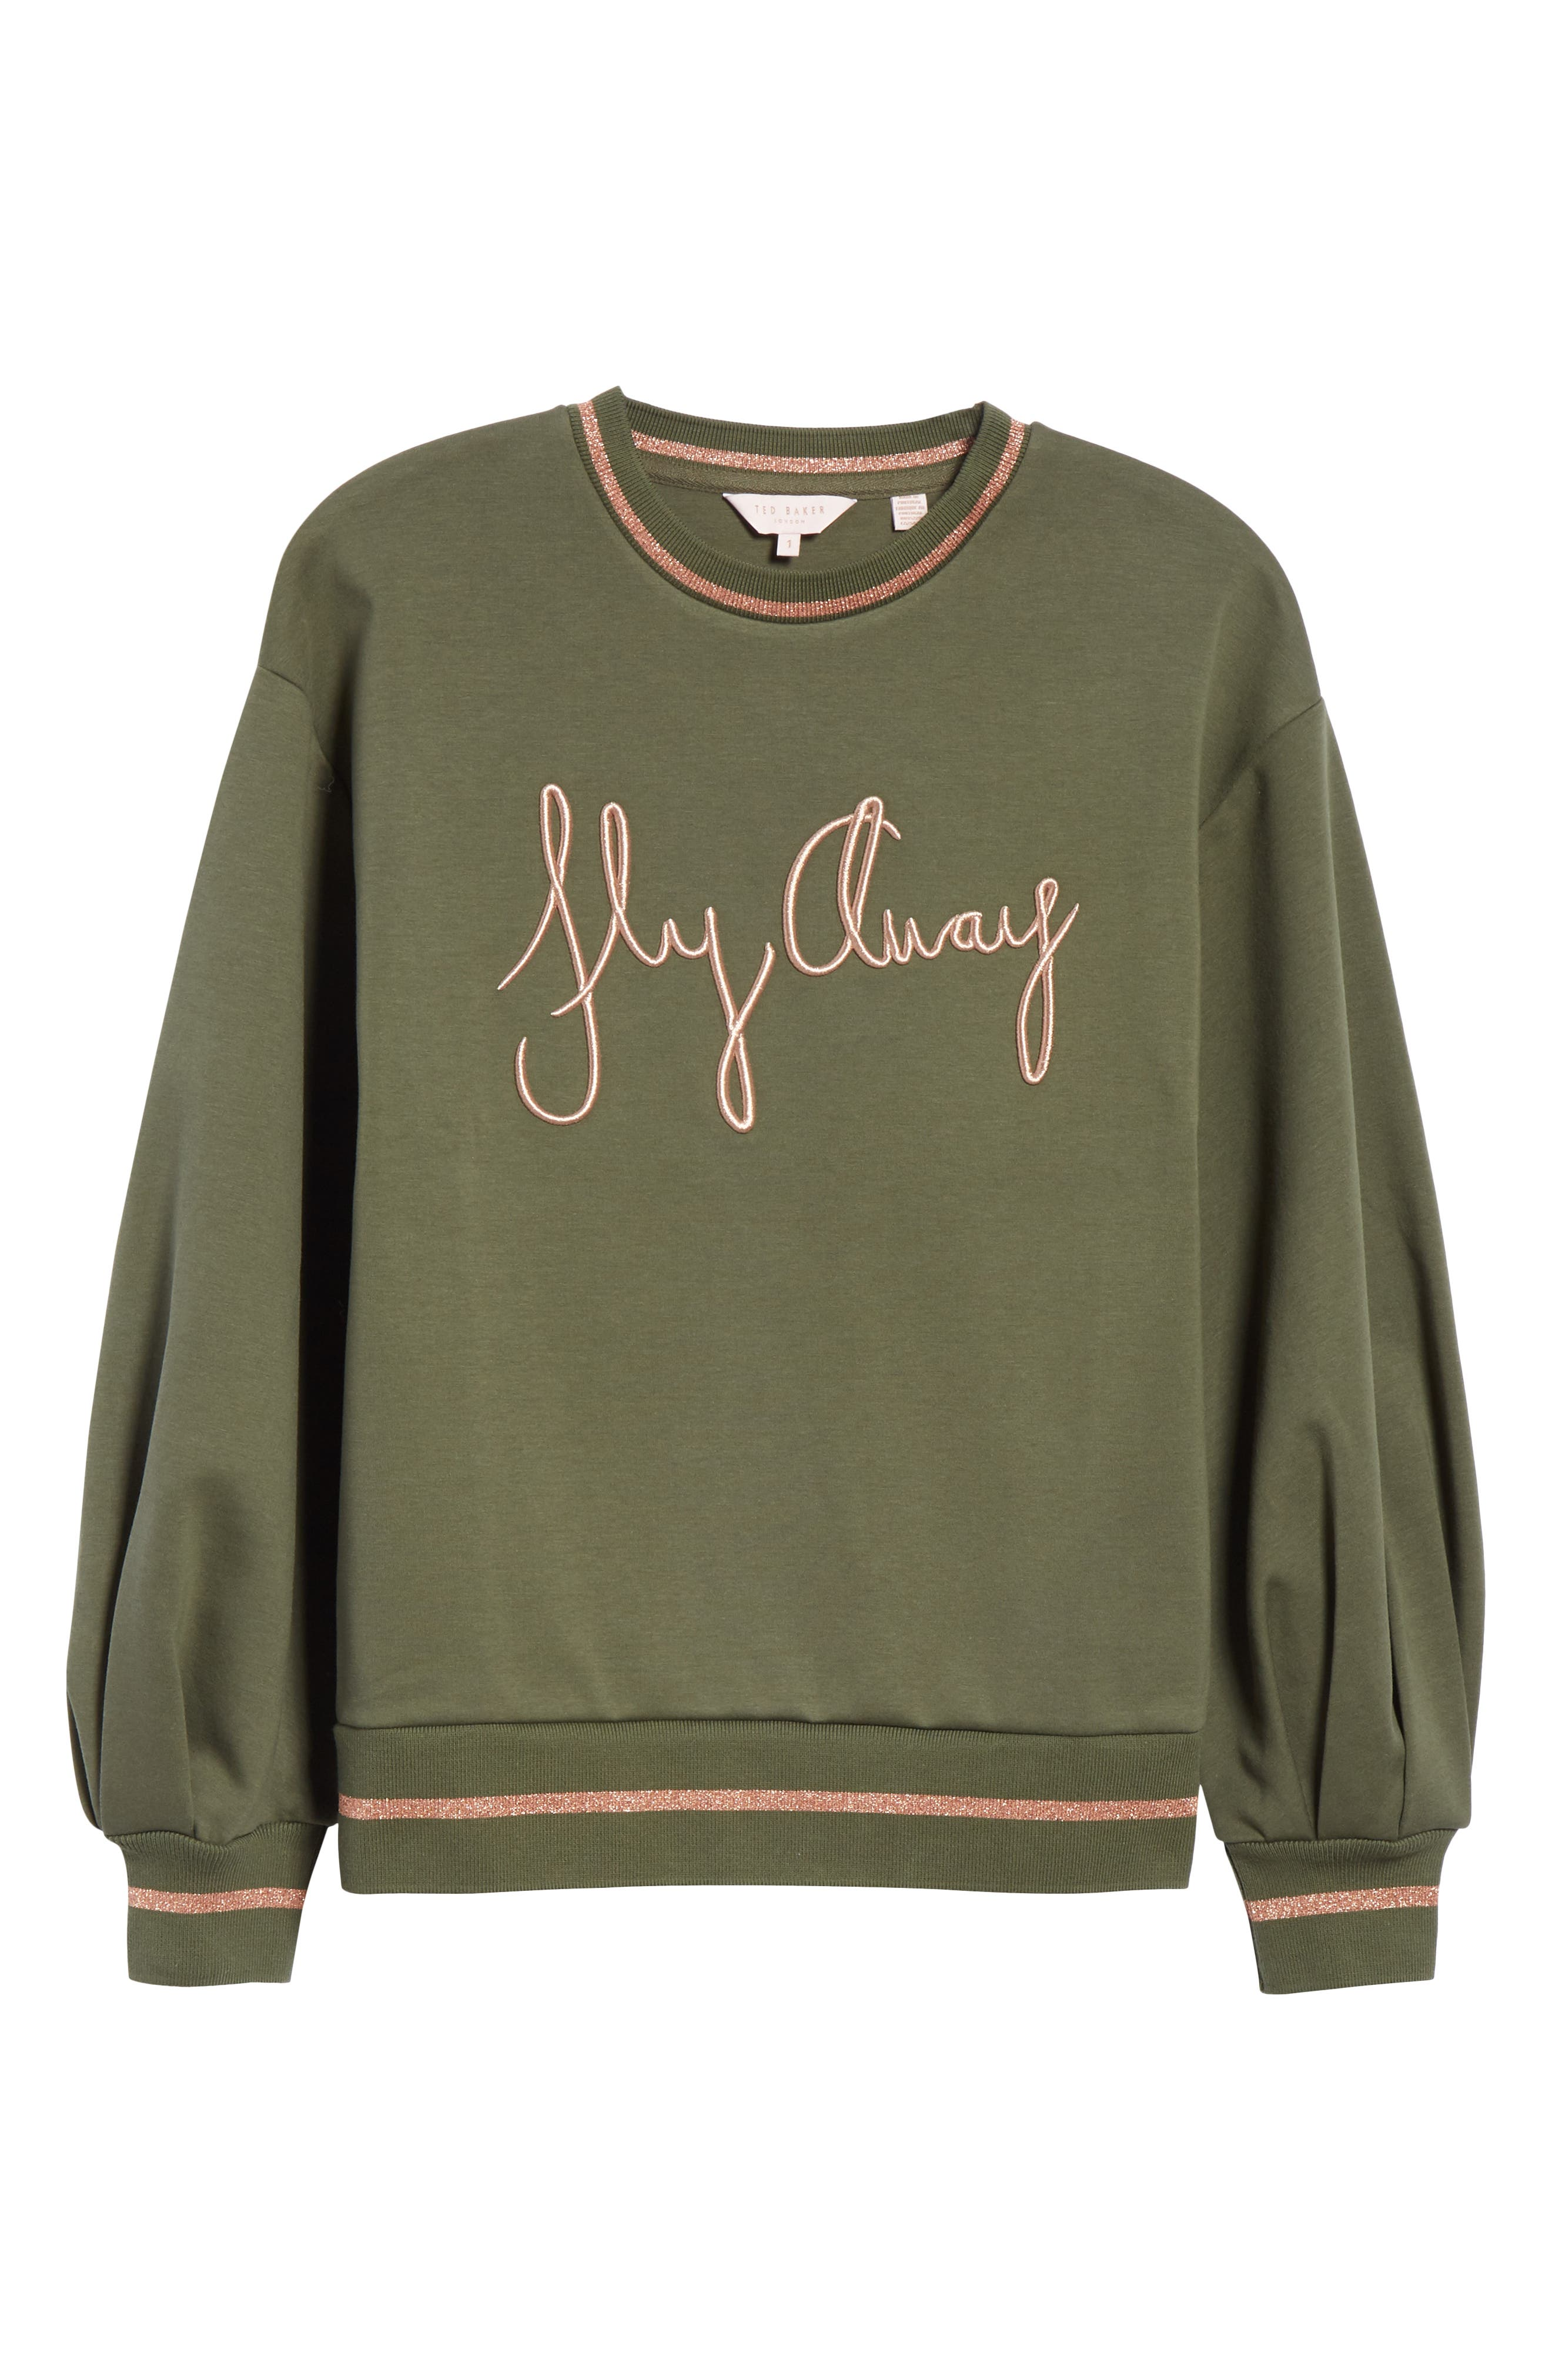 Abileen Fly Away Embroidered Sweatshirt,                             Alternate thumbnail 6, color,                             Khaki